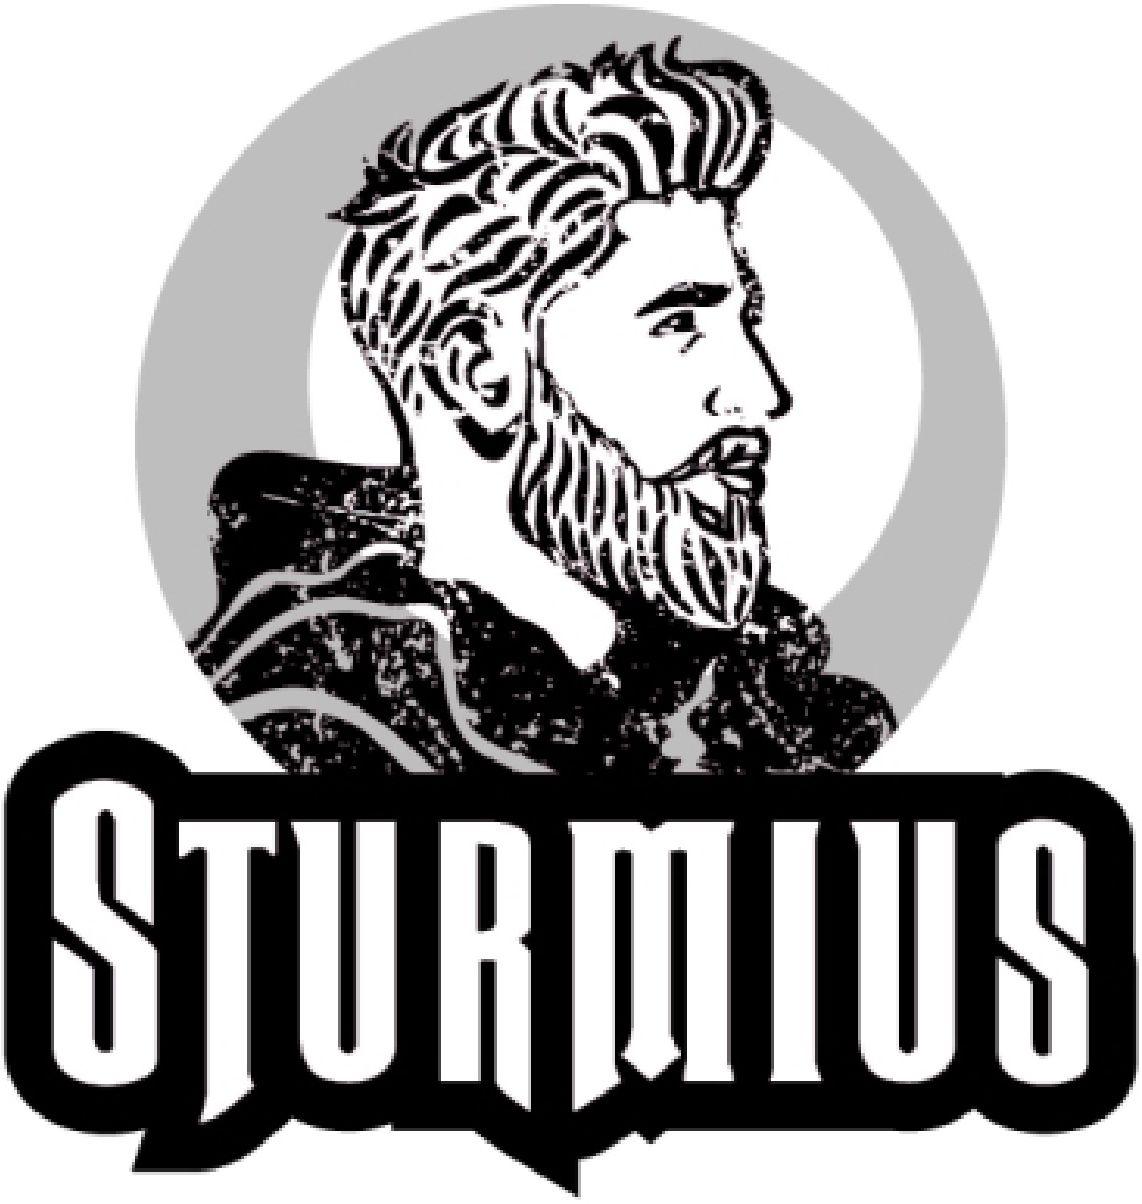 Wort-/Bildmarke: STURMIUS